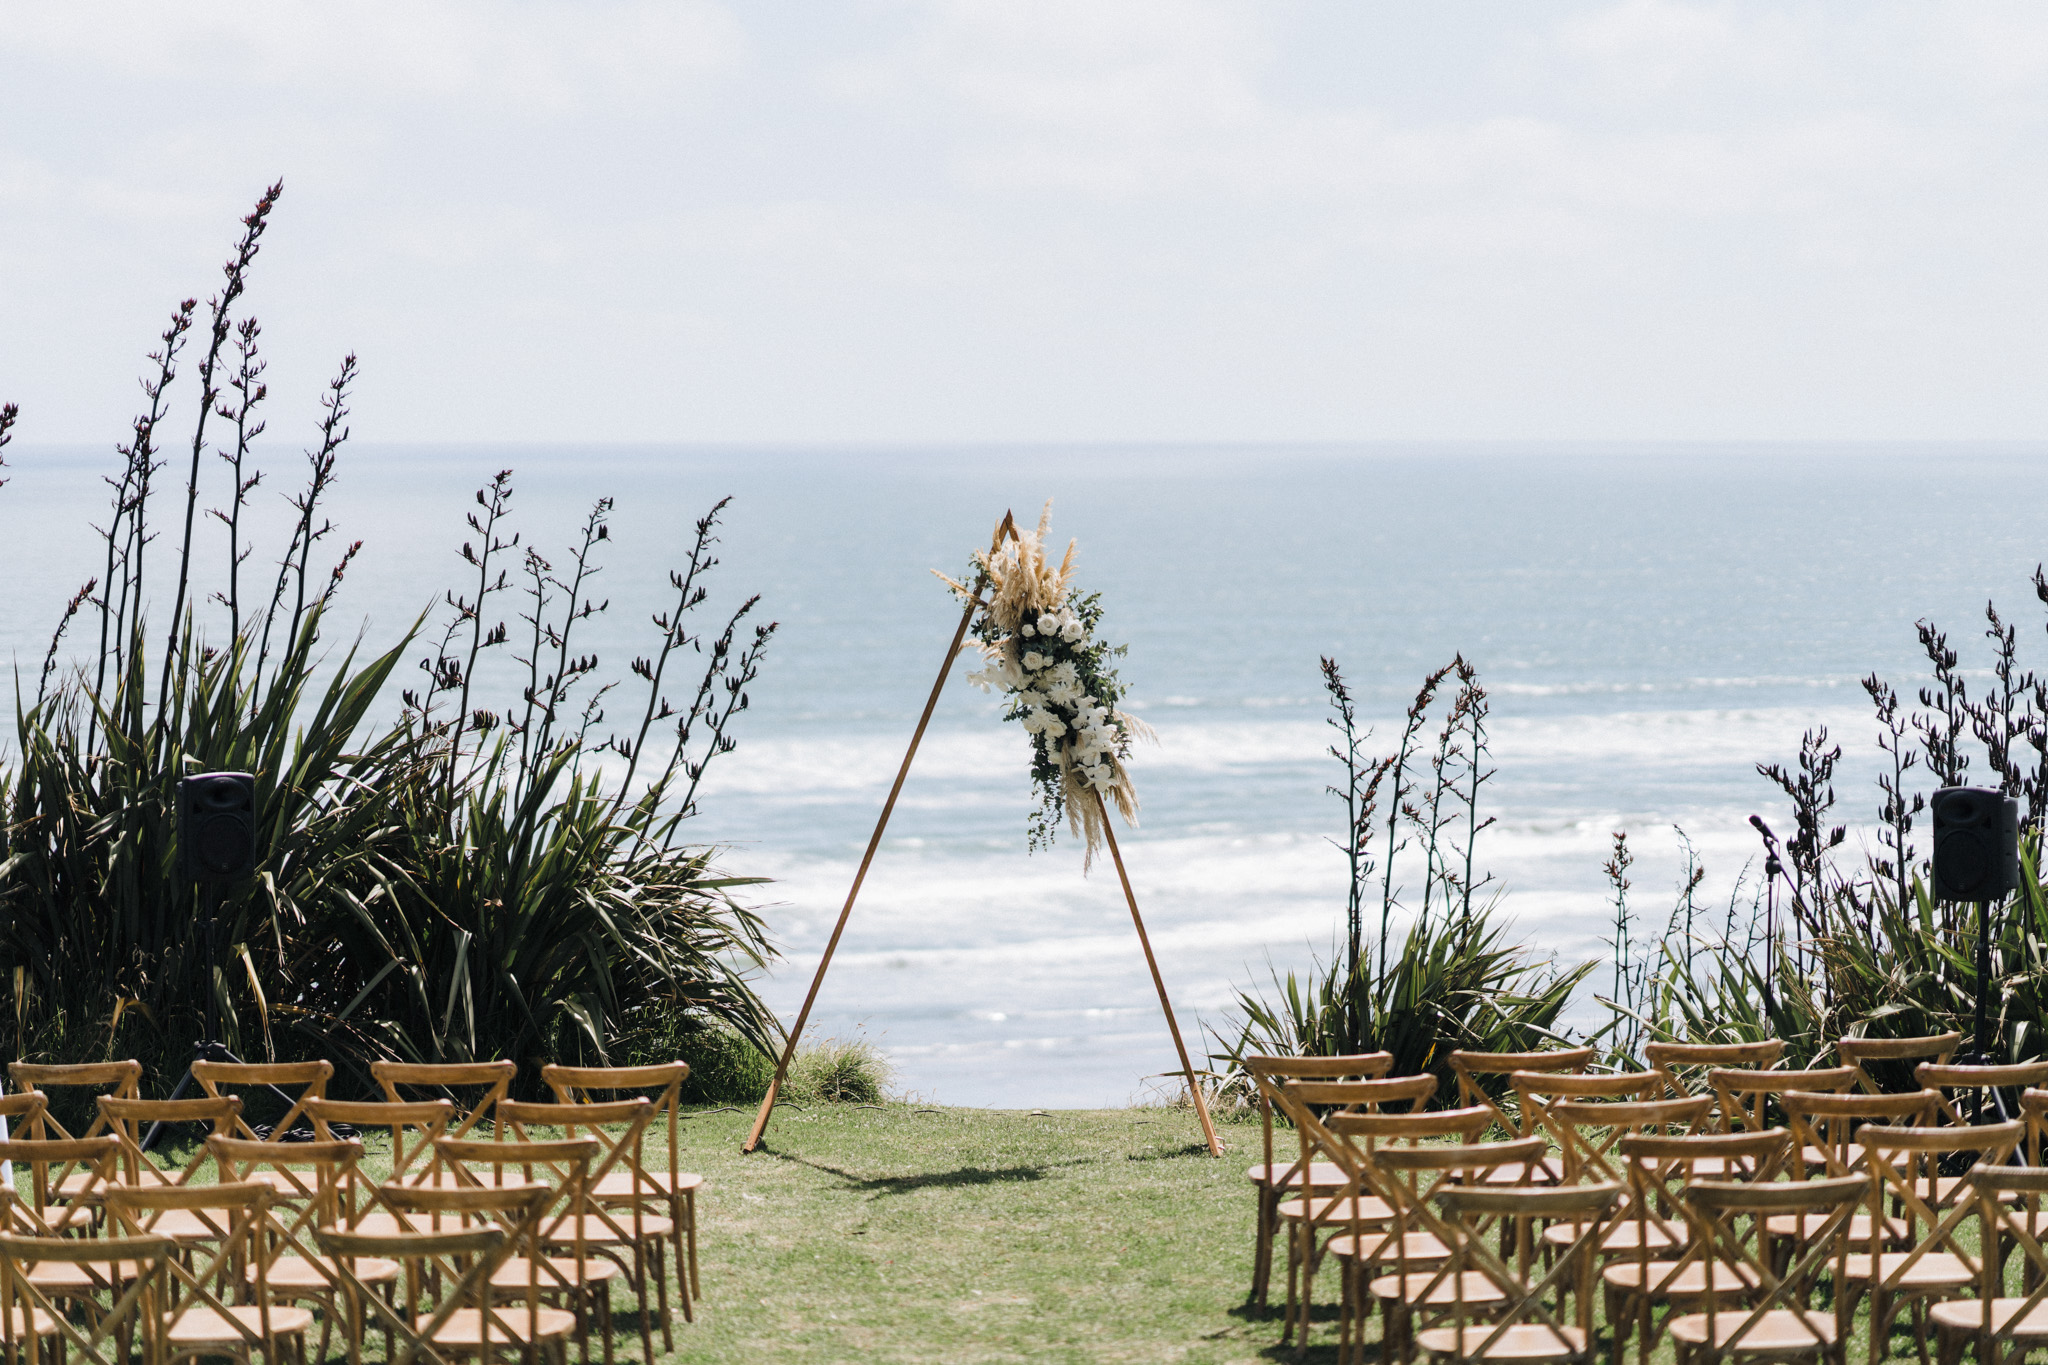 newfound-h-m-castaways-waiuku-auckland-wedding-photographer-106